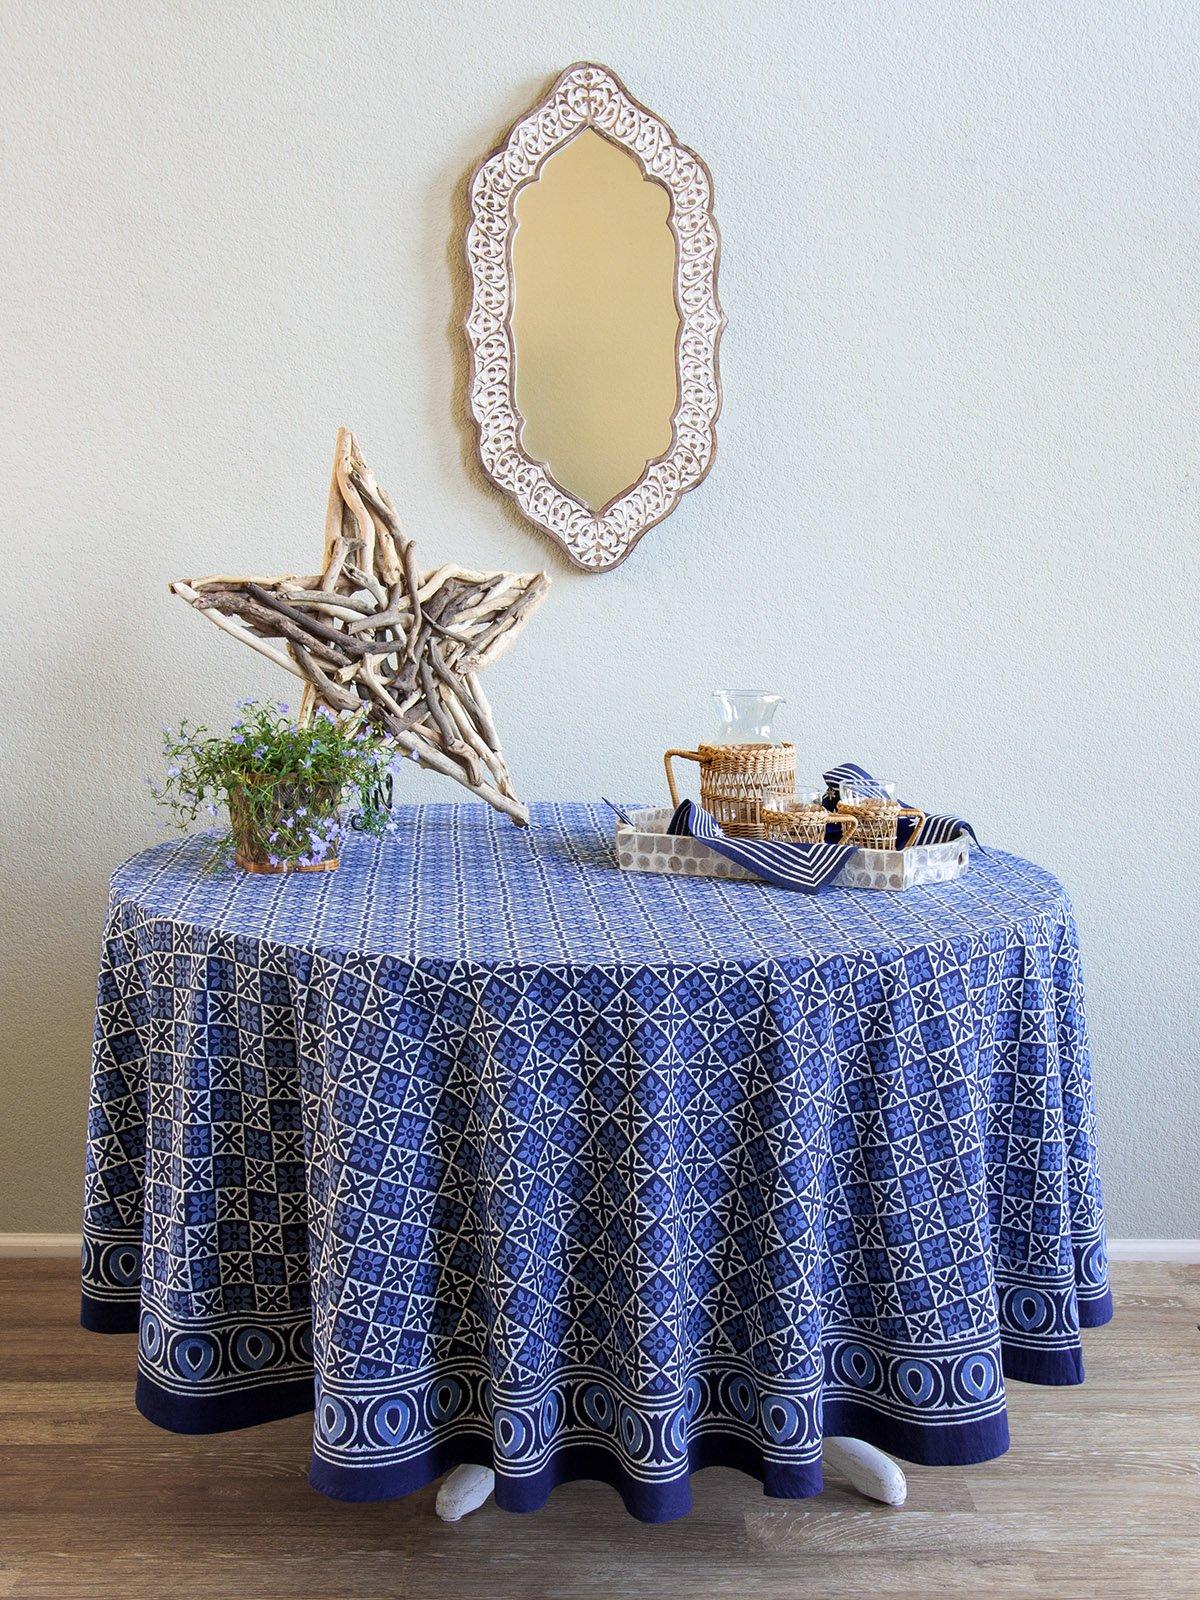 Starry Nights ~ Designer Batik Blue Round India Tablecloth 70 Round